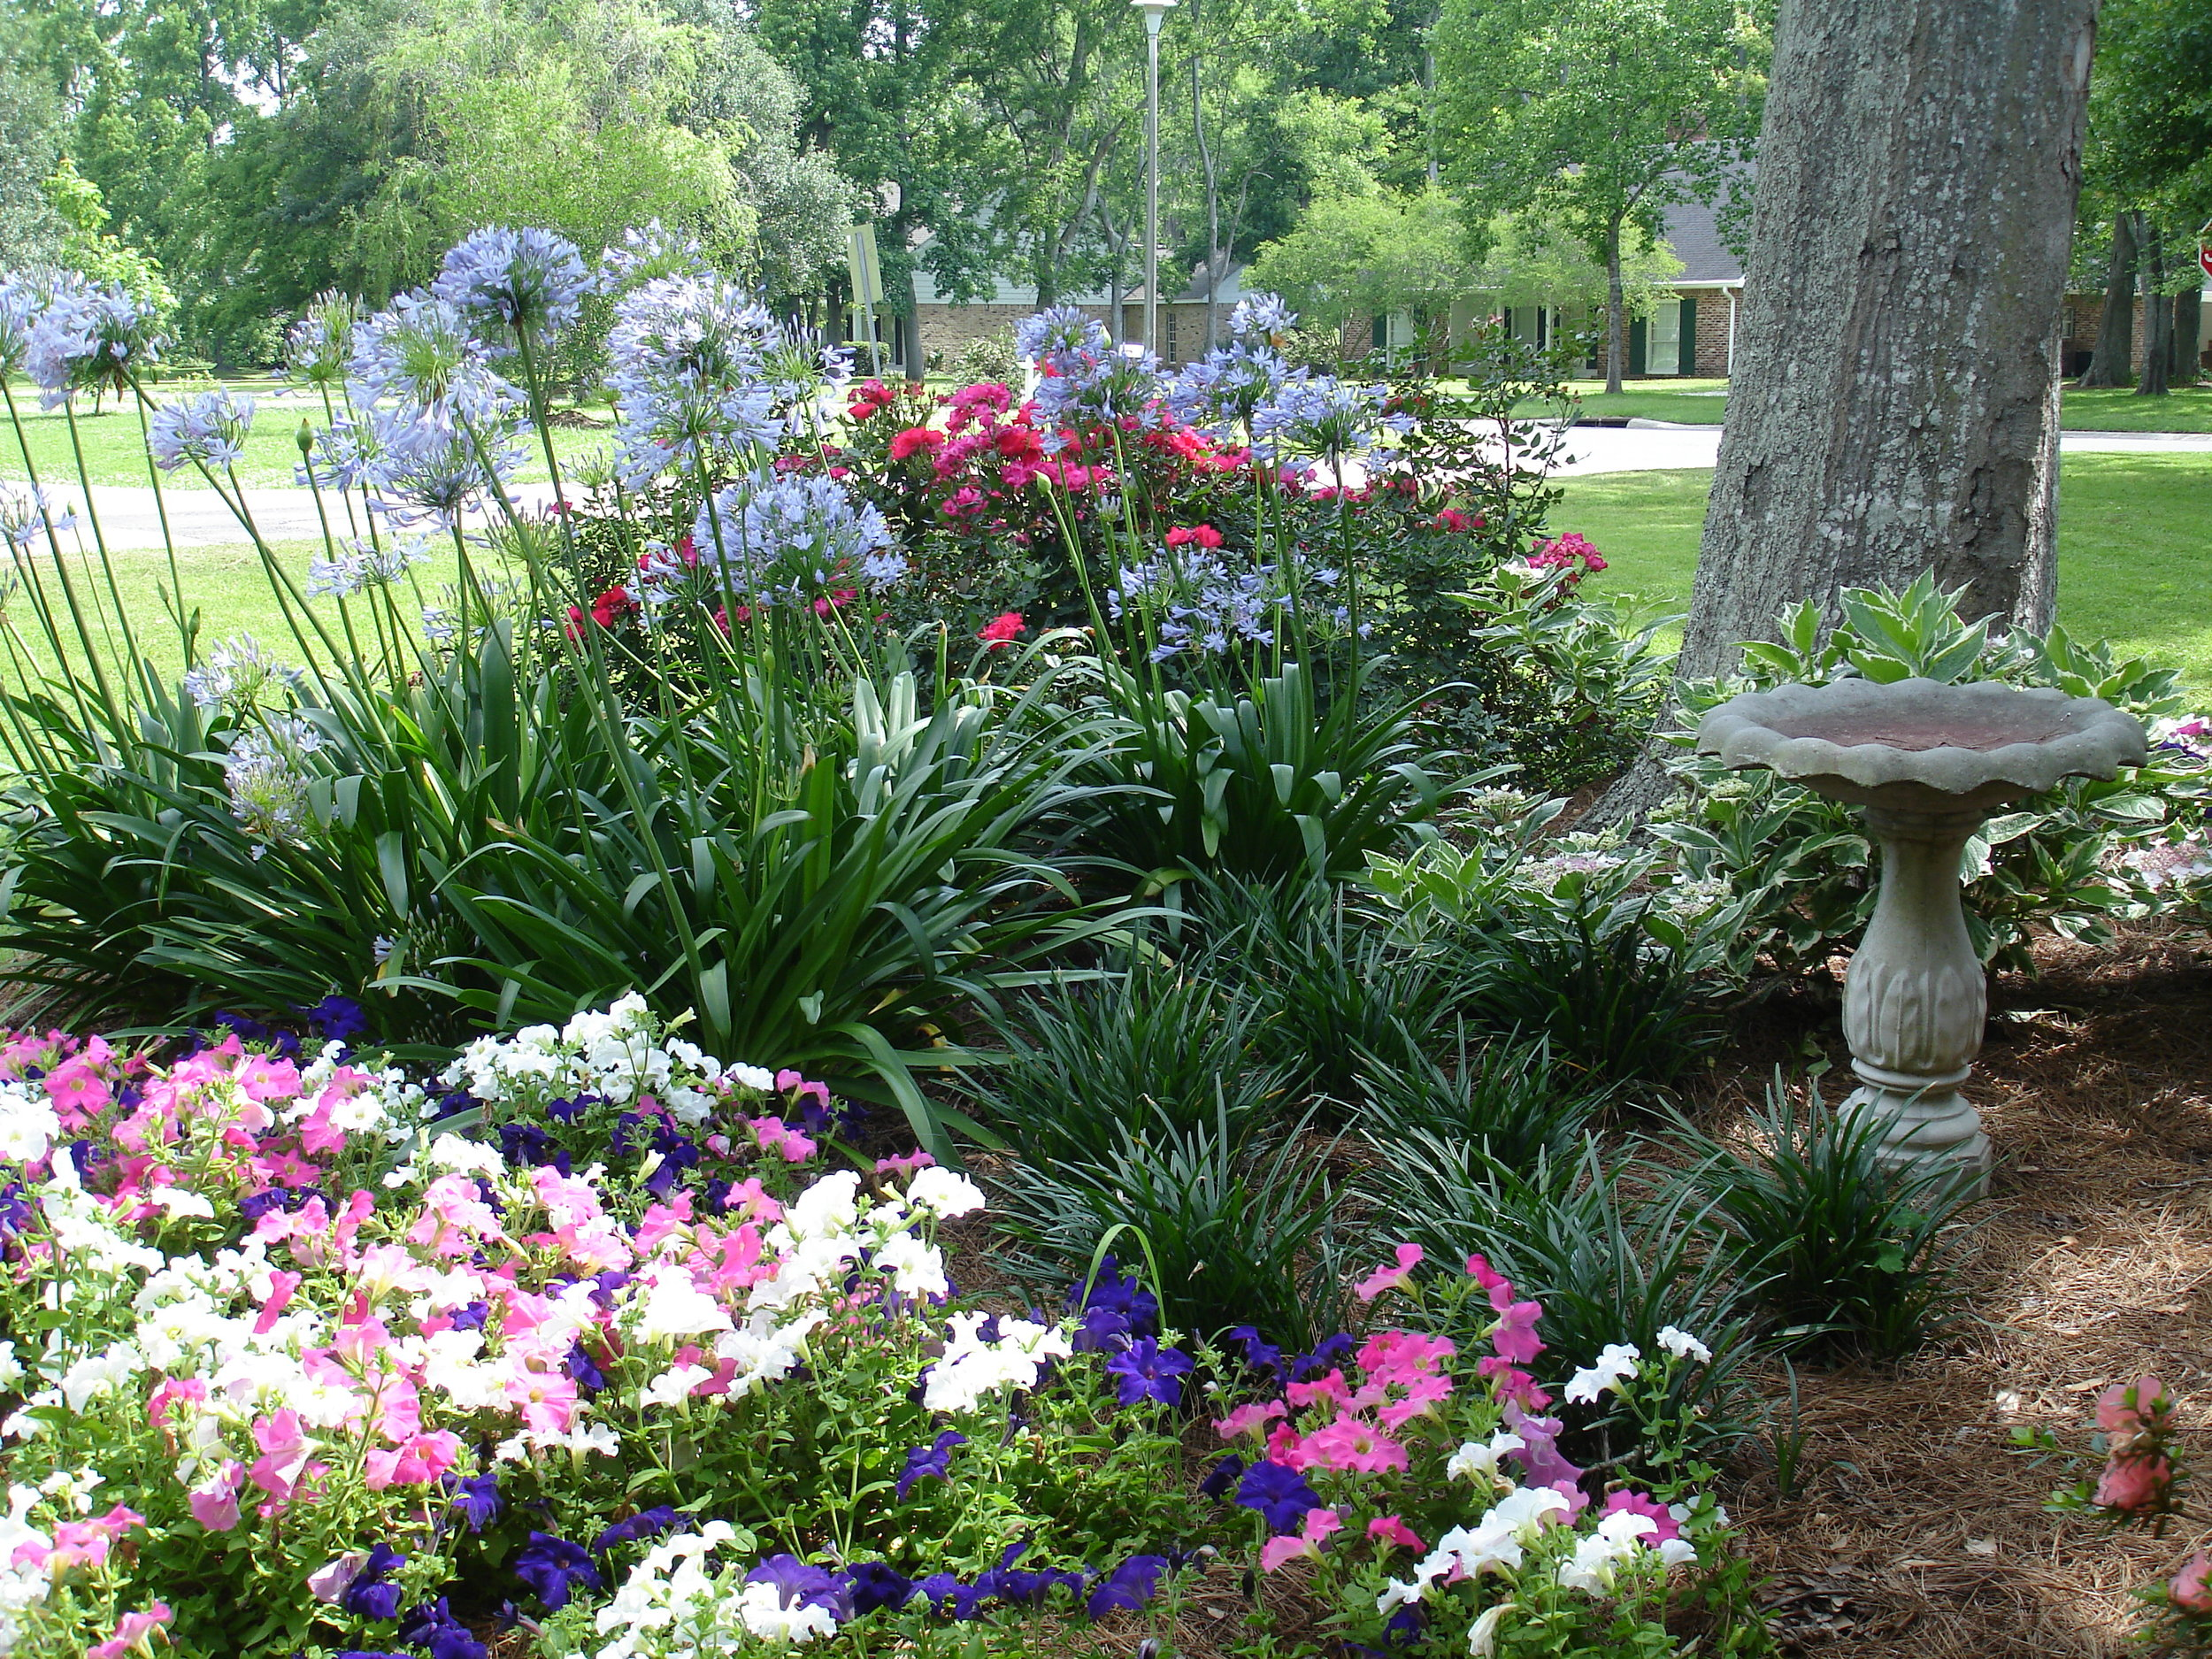 flowerbed-maintenance-seasonal-color-baton-rouge-area (10).JPG